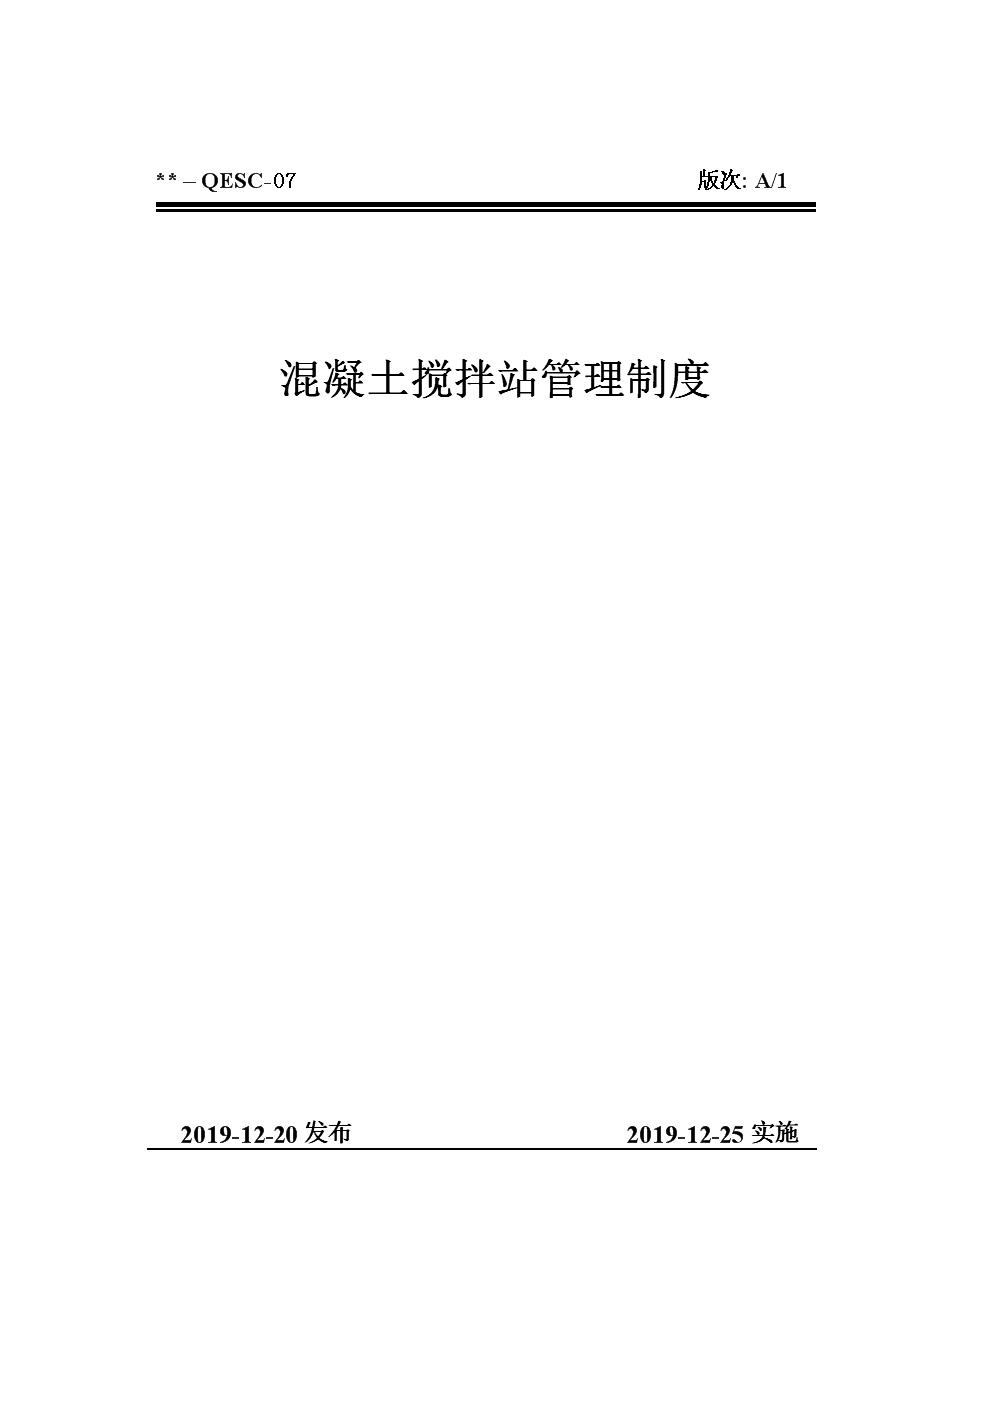 QESC-07混凝土搅拌站管理制度(EPC三标体系-作业文件)3-9.doc